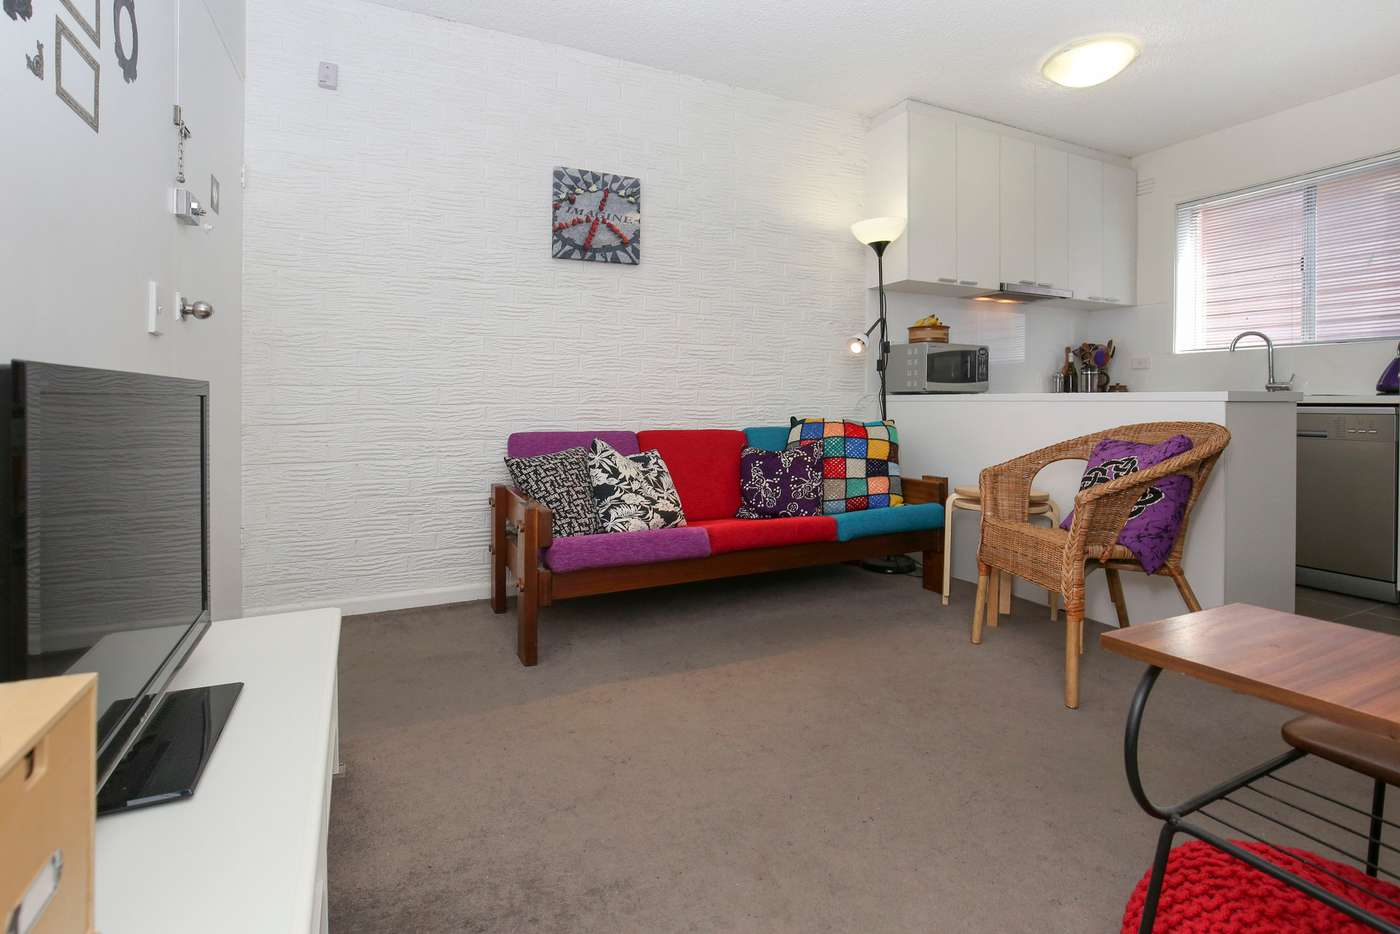 Sixth view of Homely apartment listing, 6/62 Dundas Street, Thornbury VIC 3071